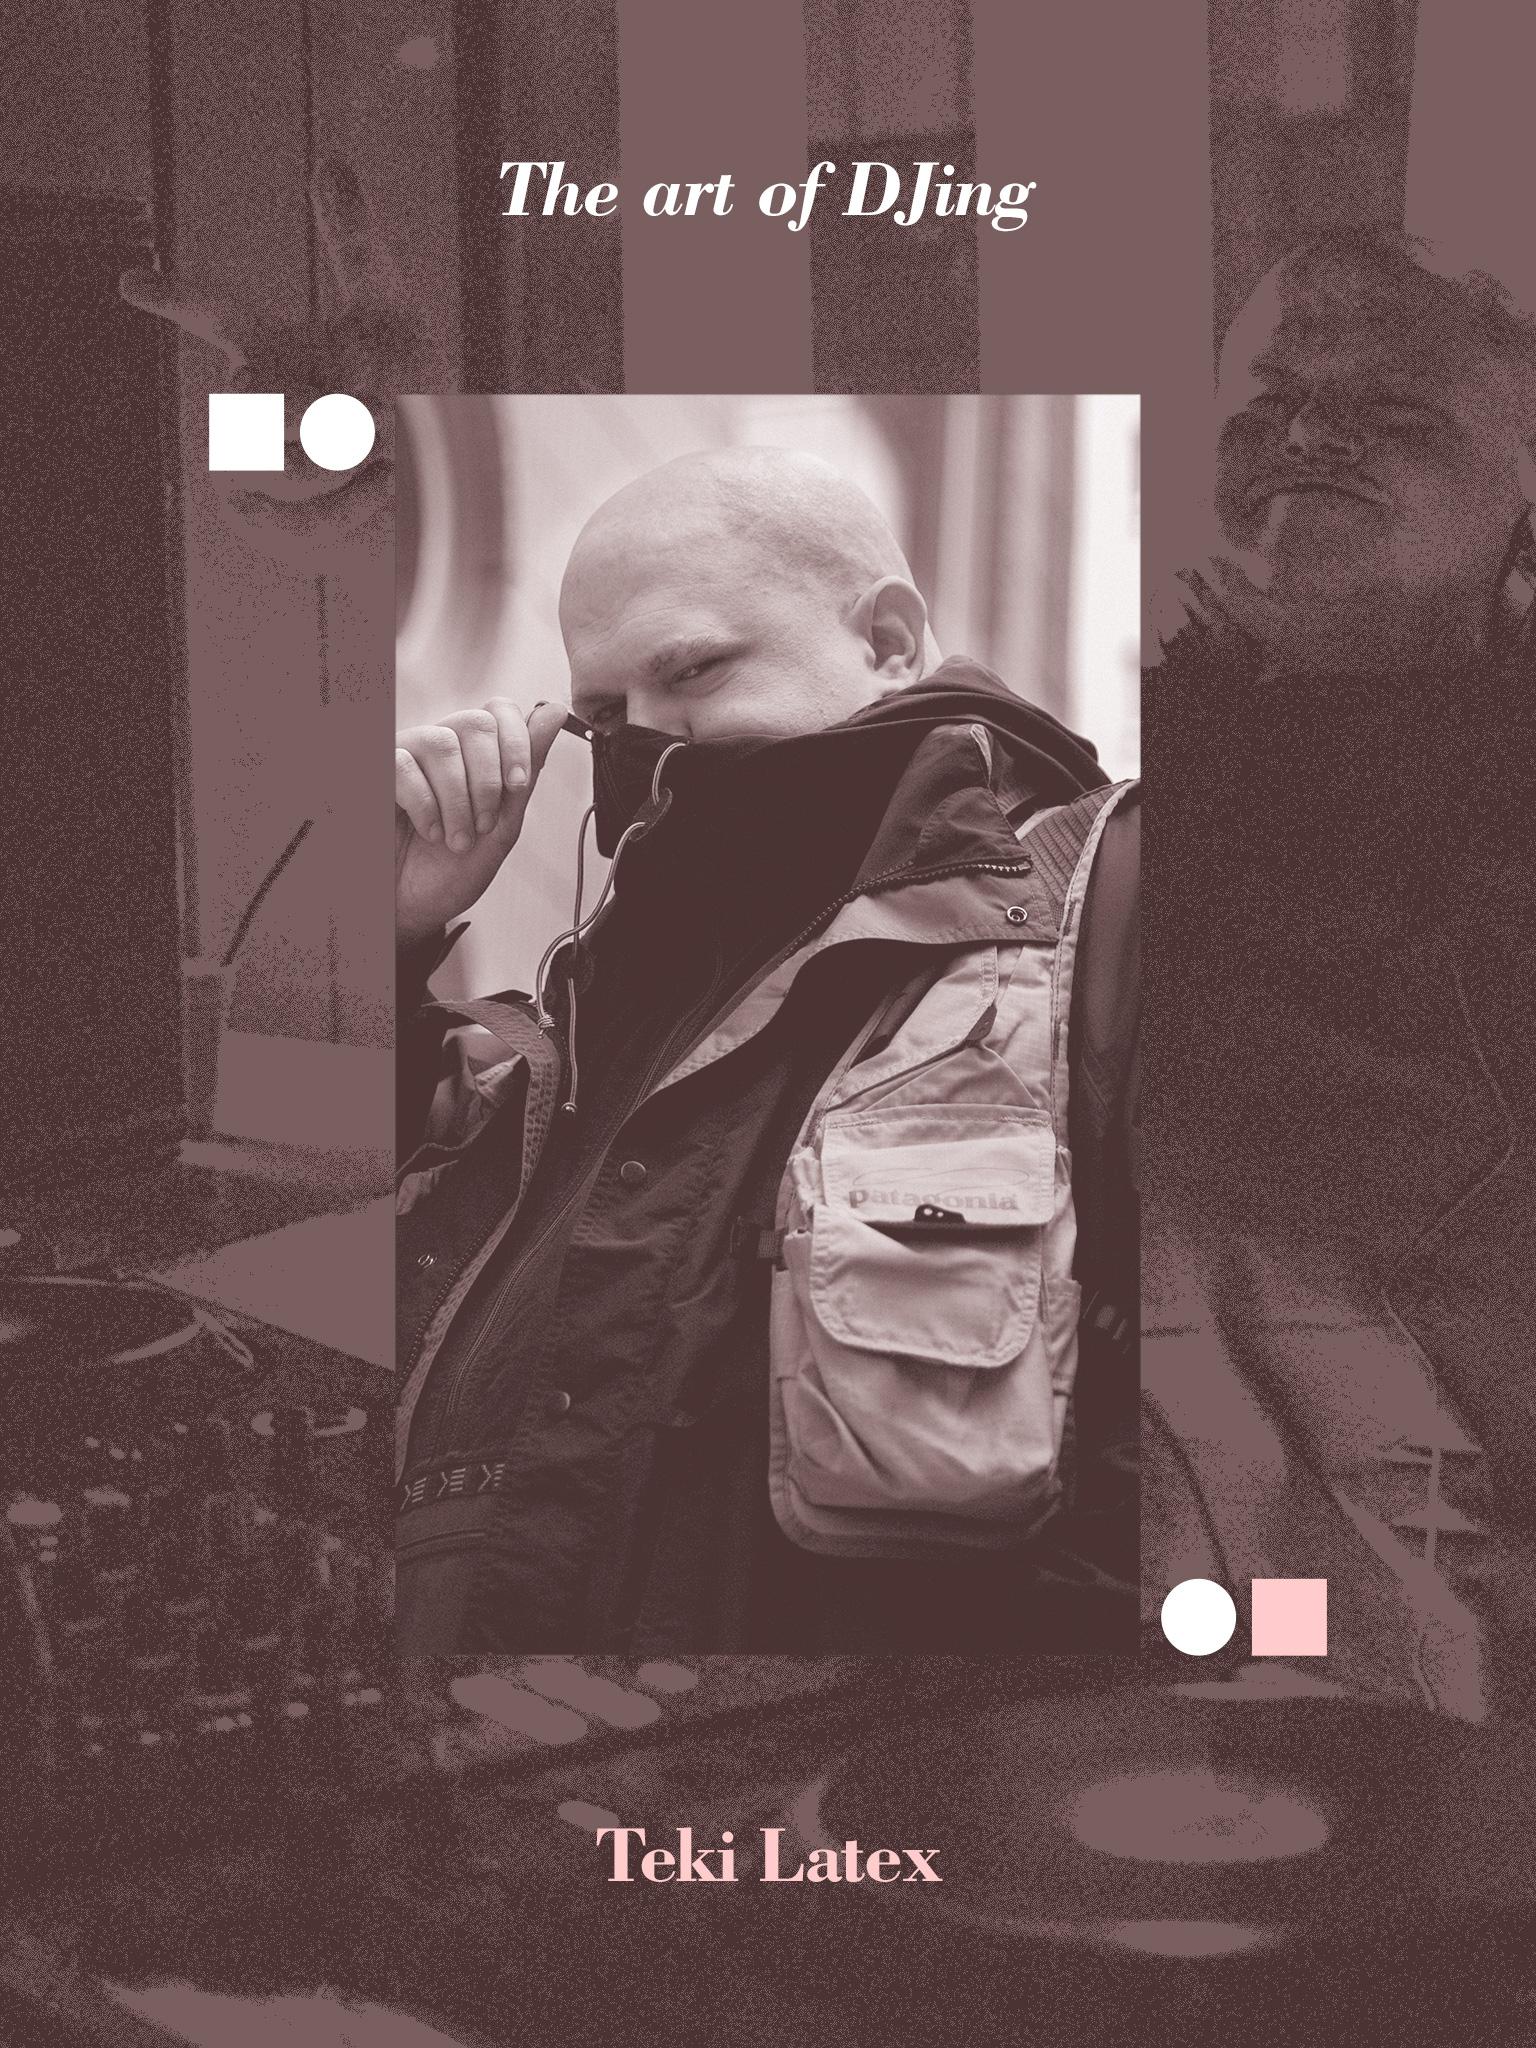 RA: The art of DJing: Teki Latex